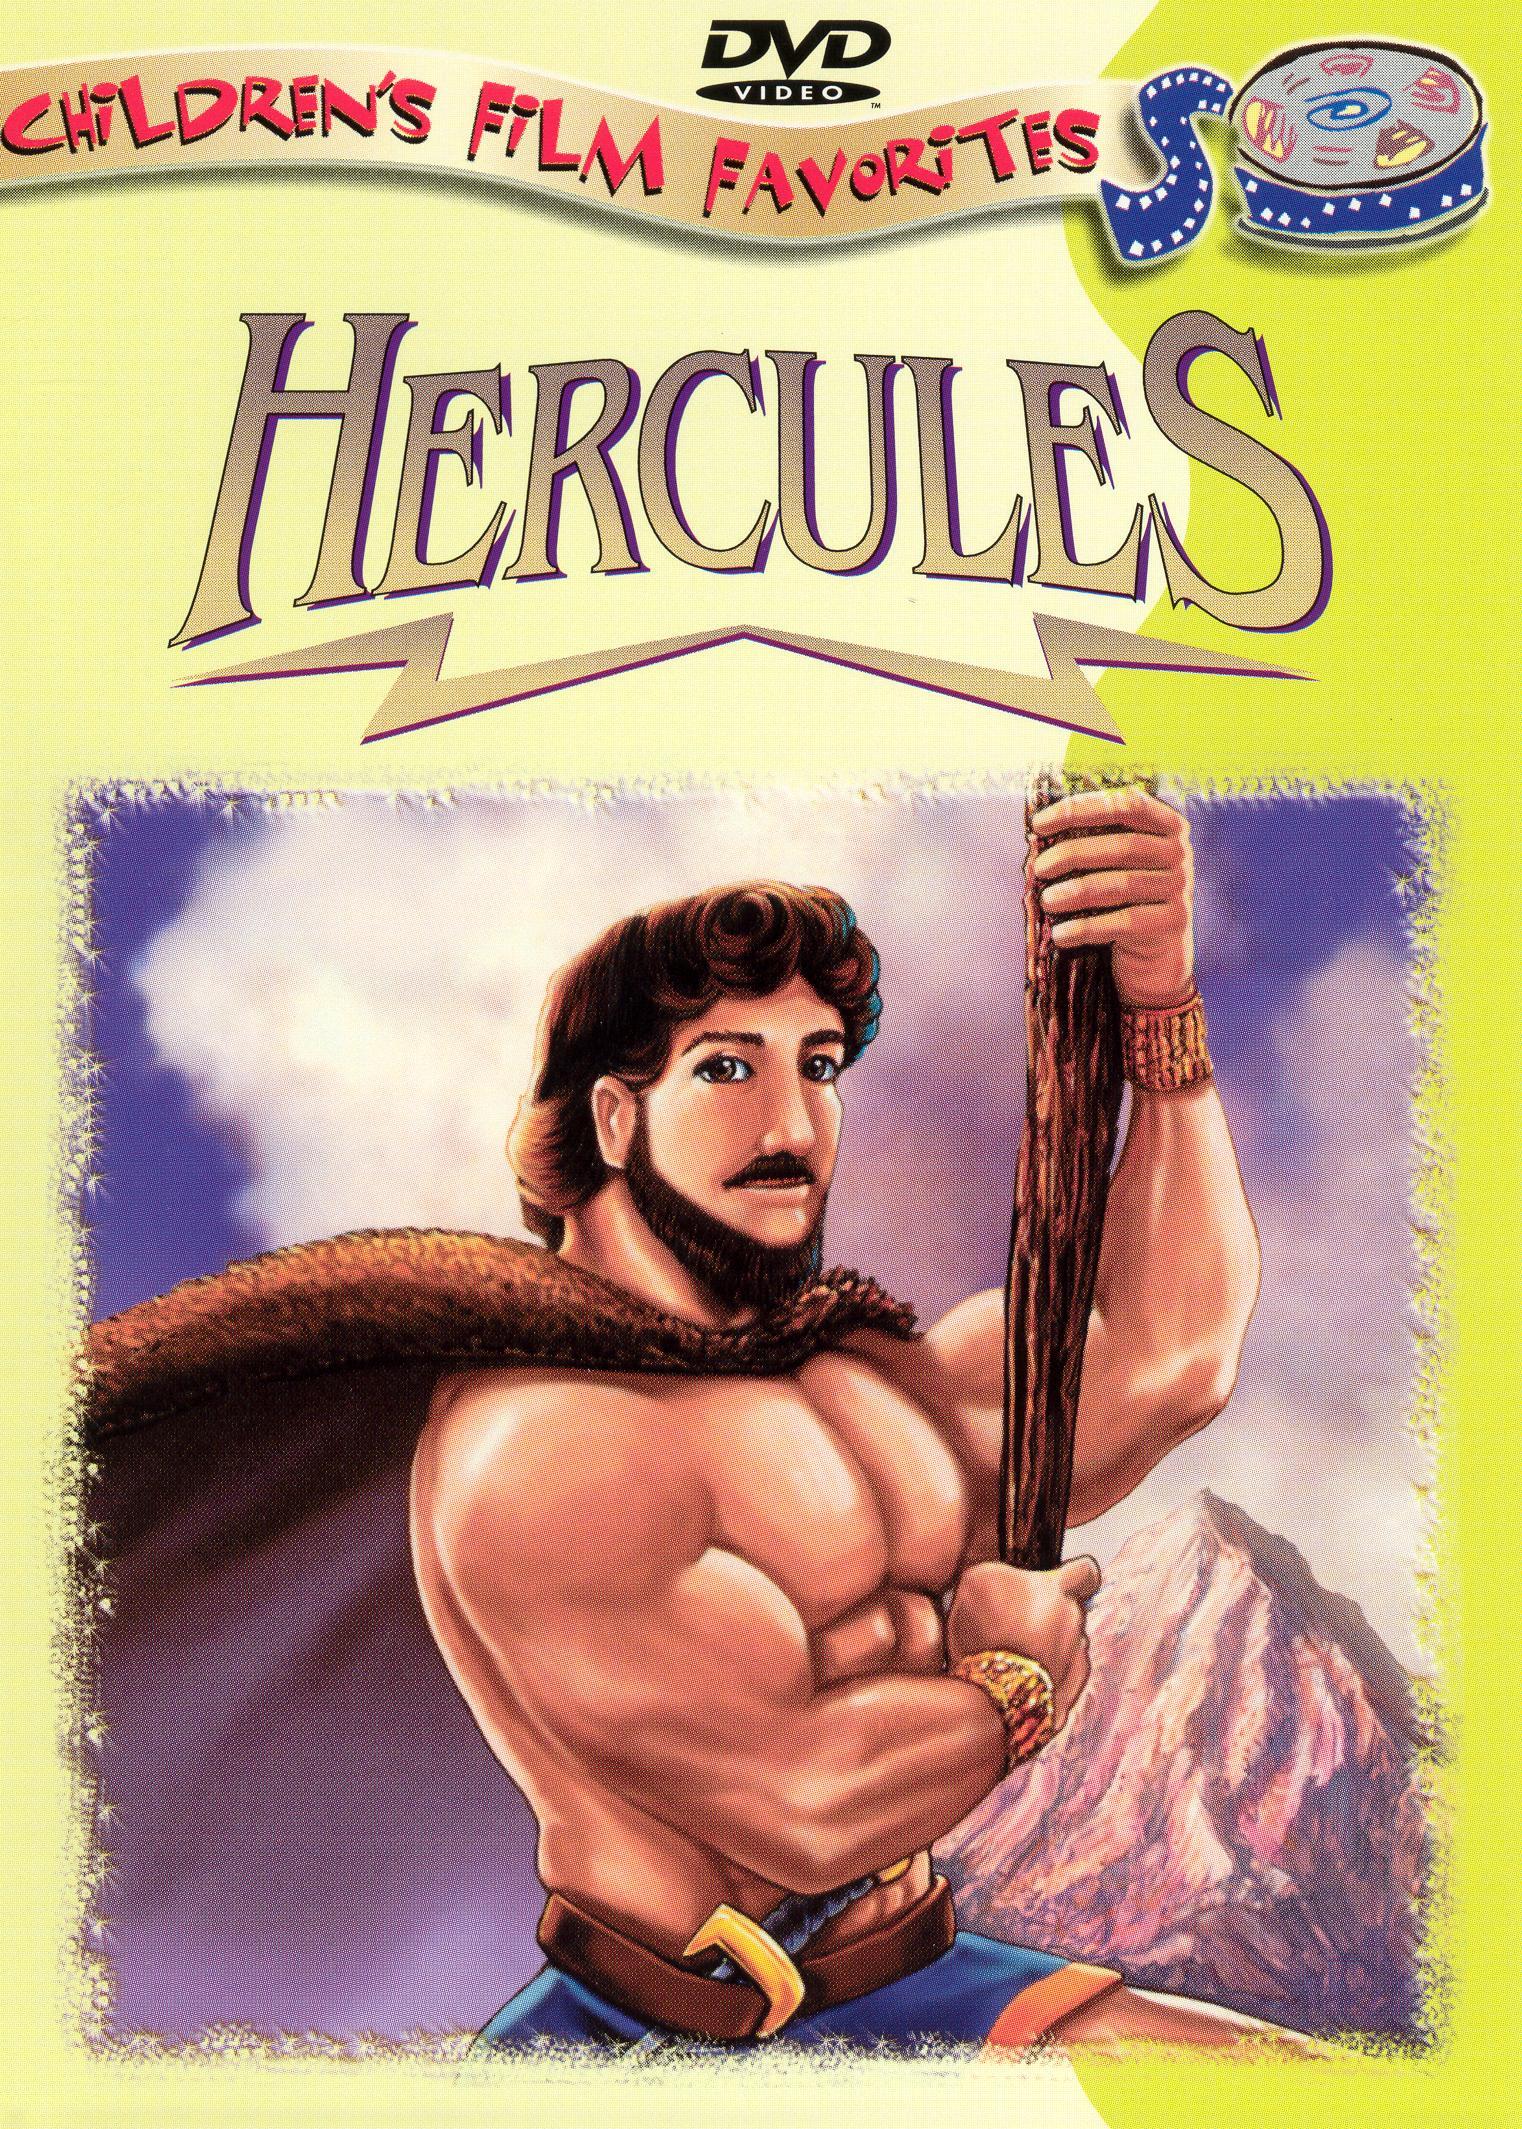 Children's Film Favorites: Hercules